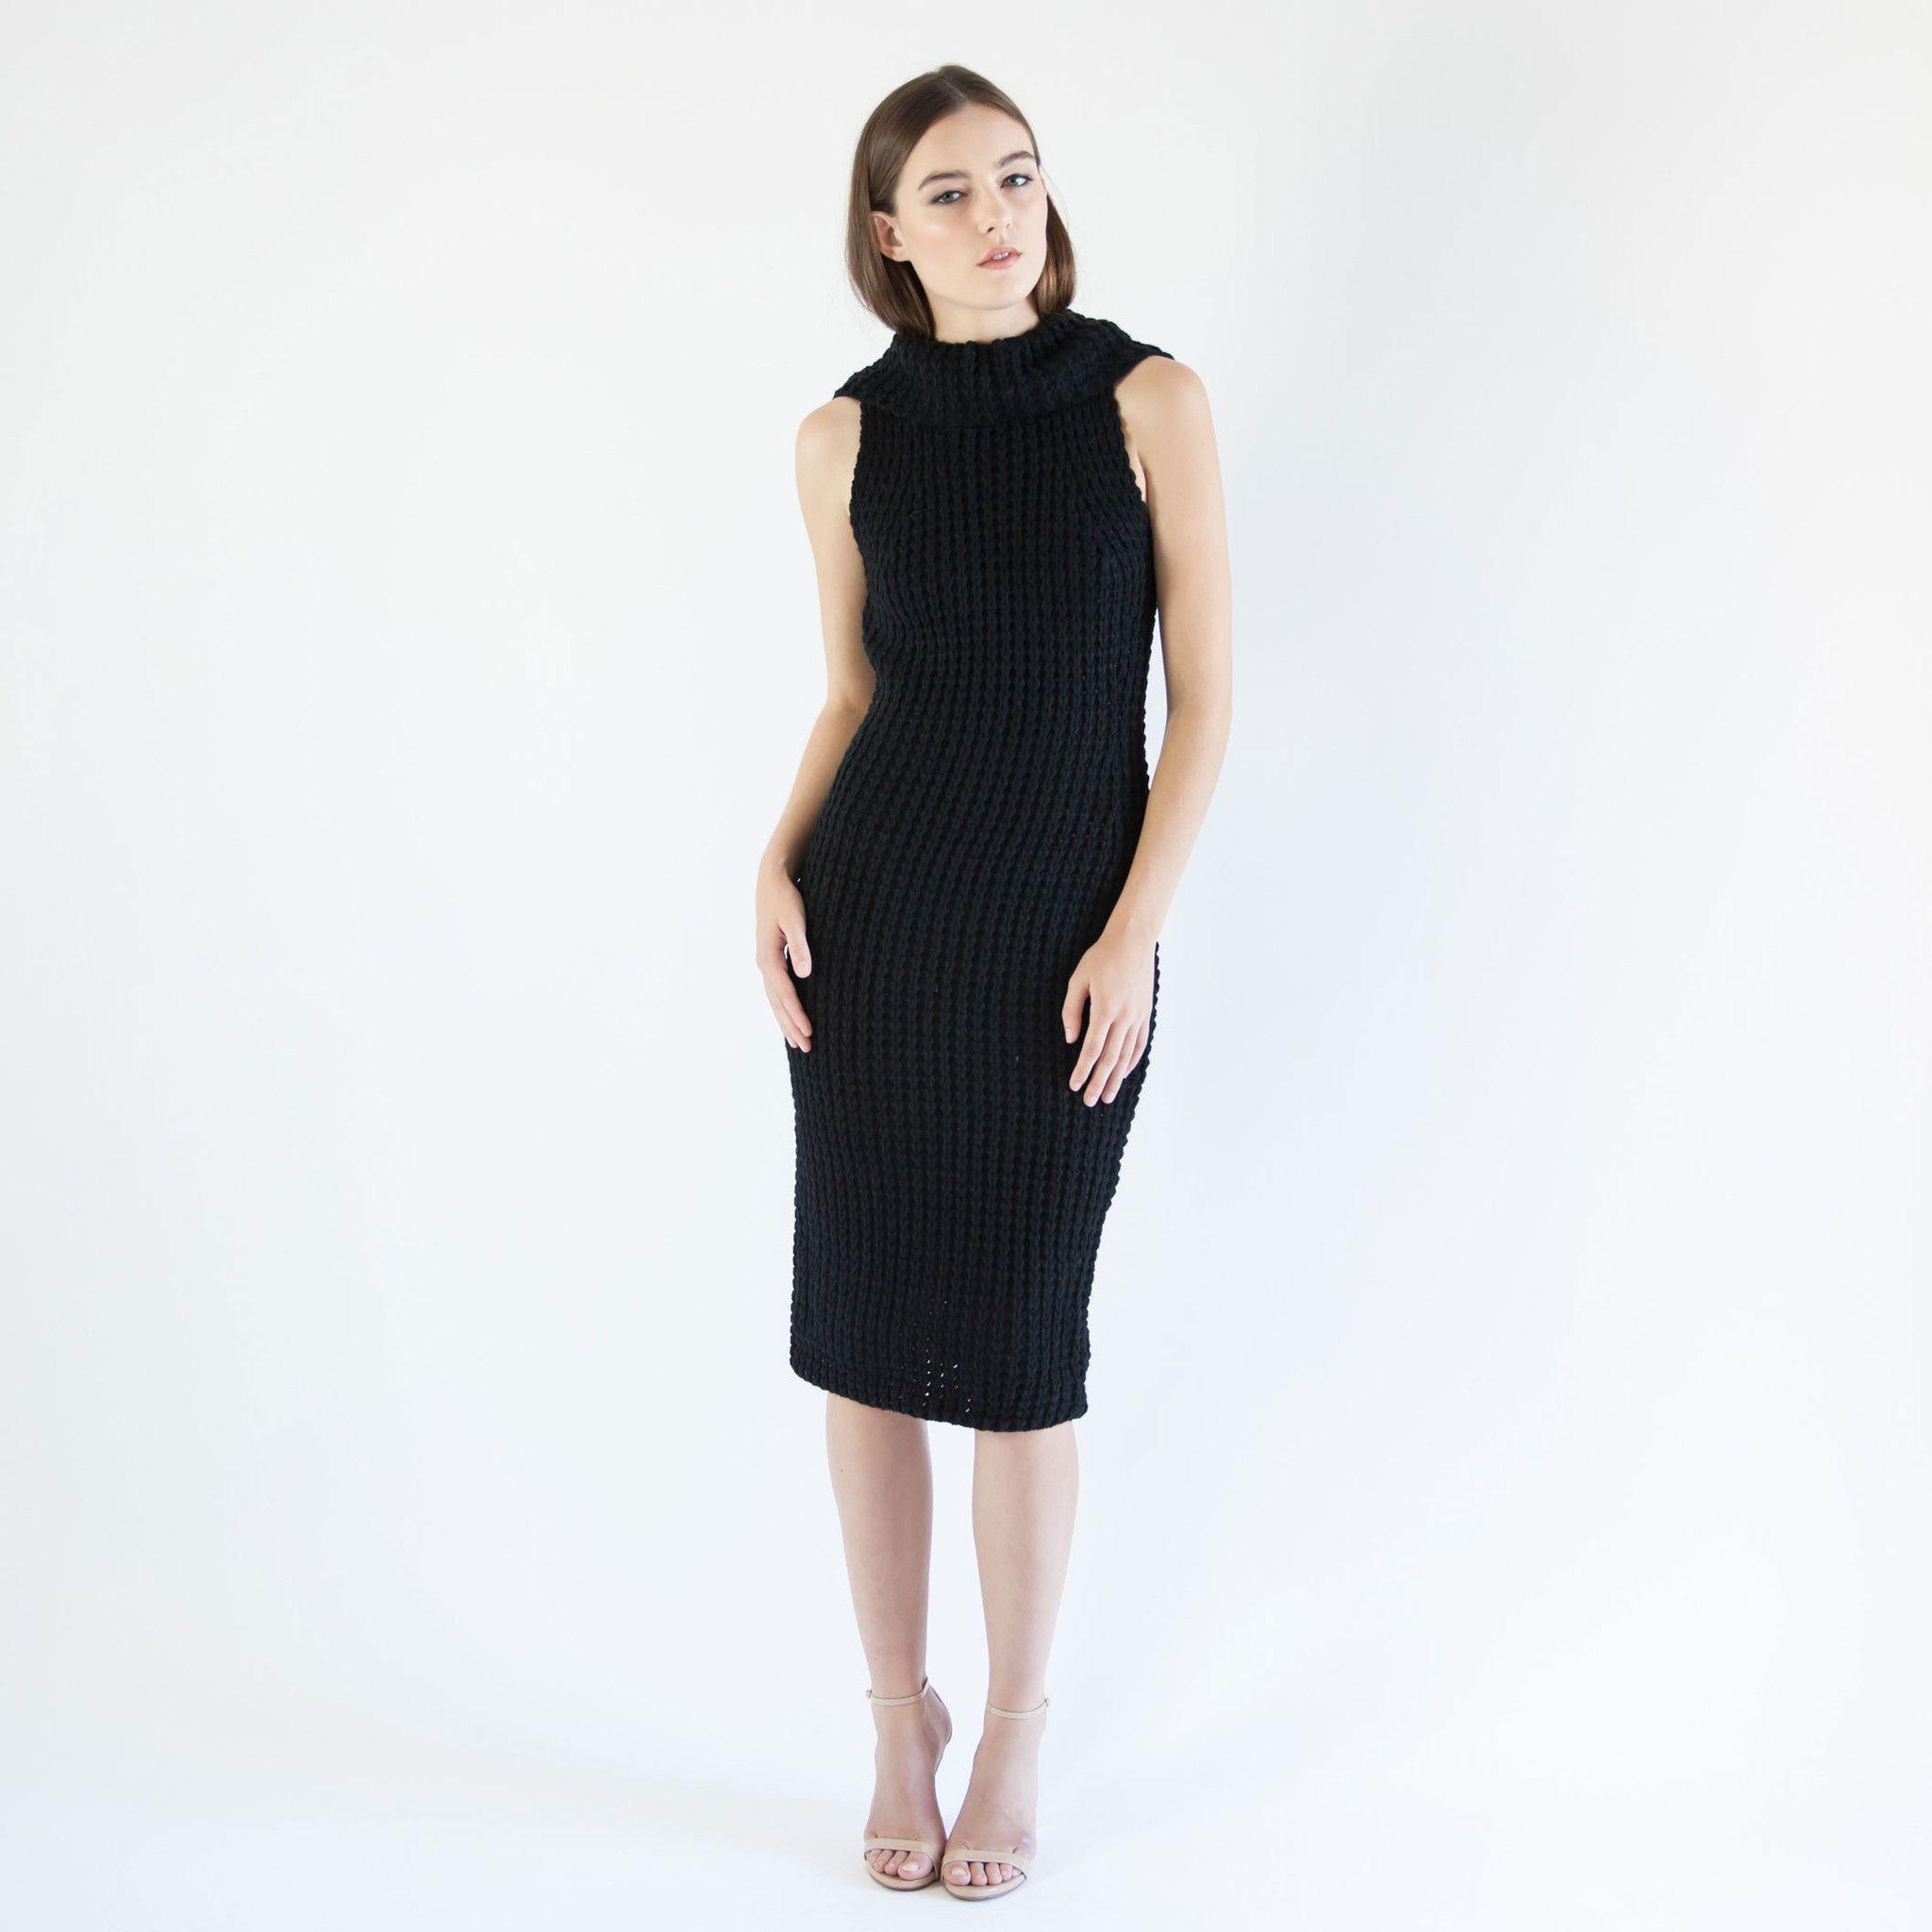 Modern citizen camilla draped turtleneck dress my style